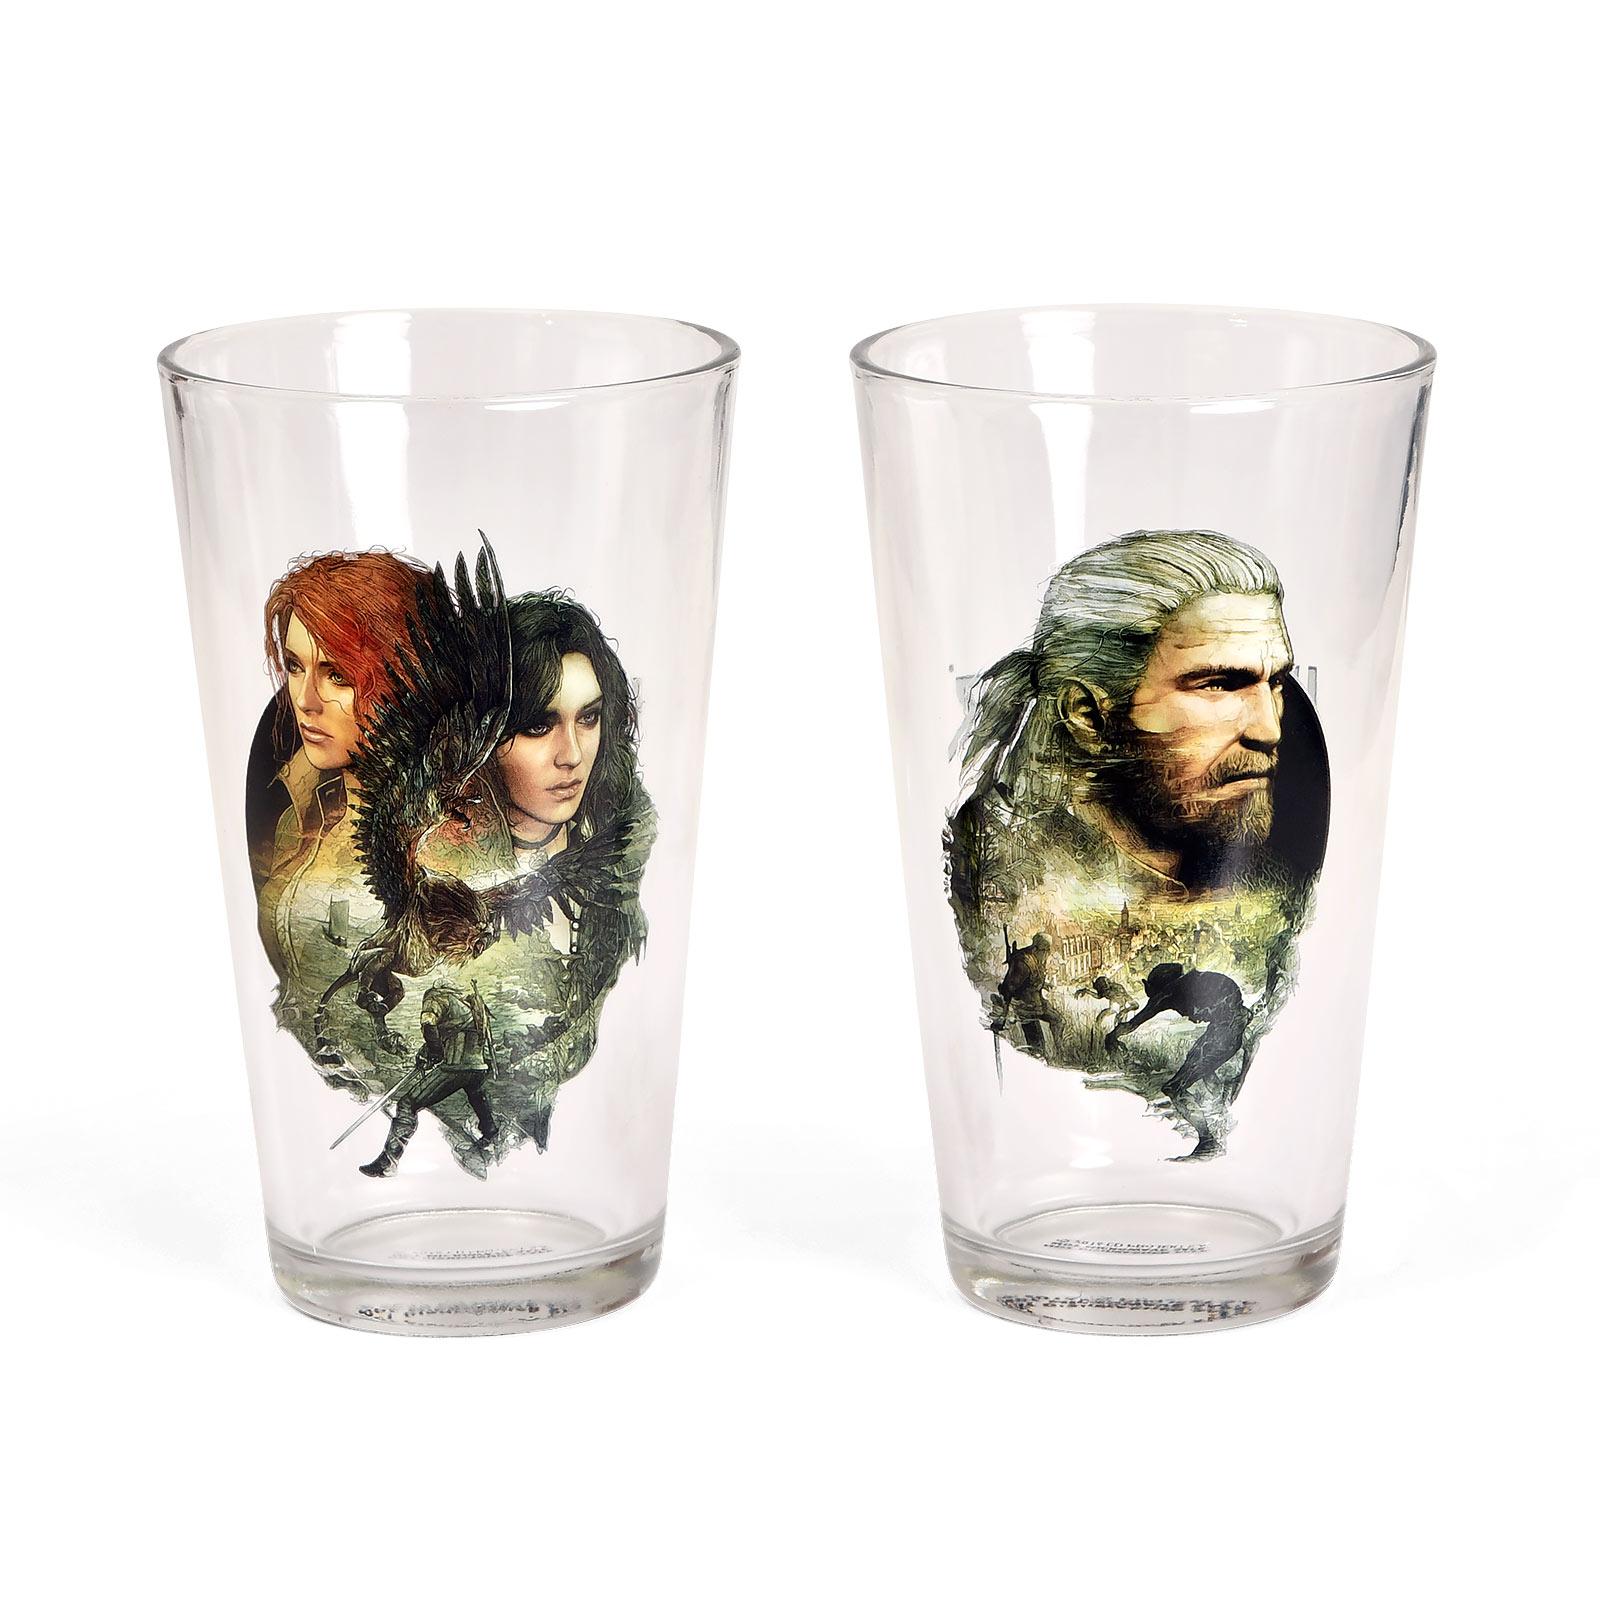 Witcher - Geralt, Triss & Yennefer Gläserset